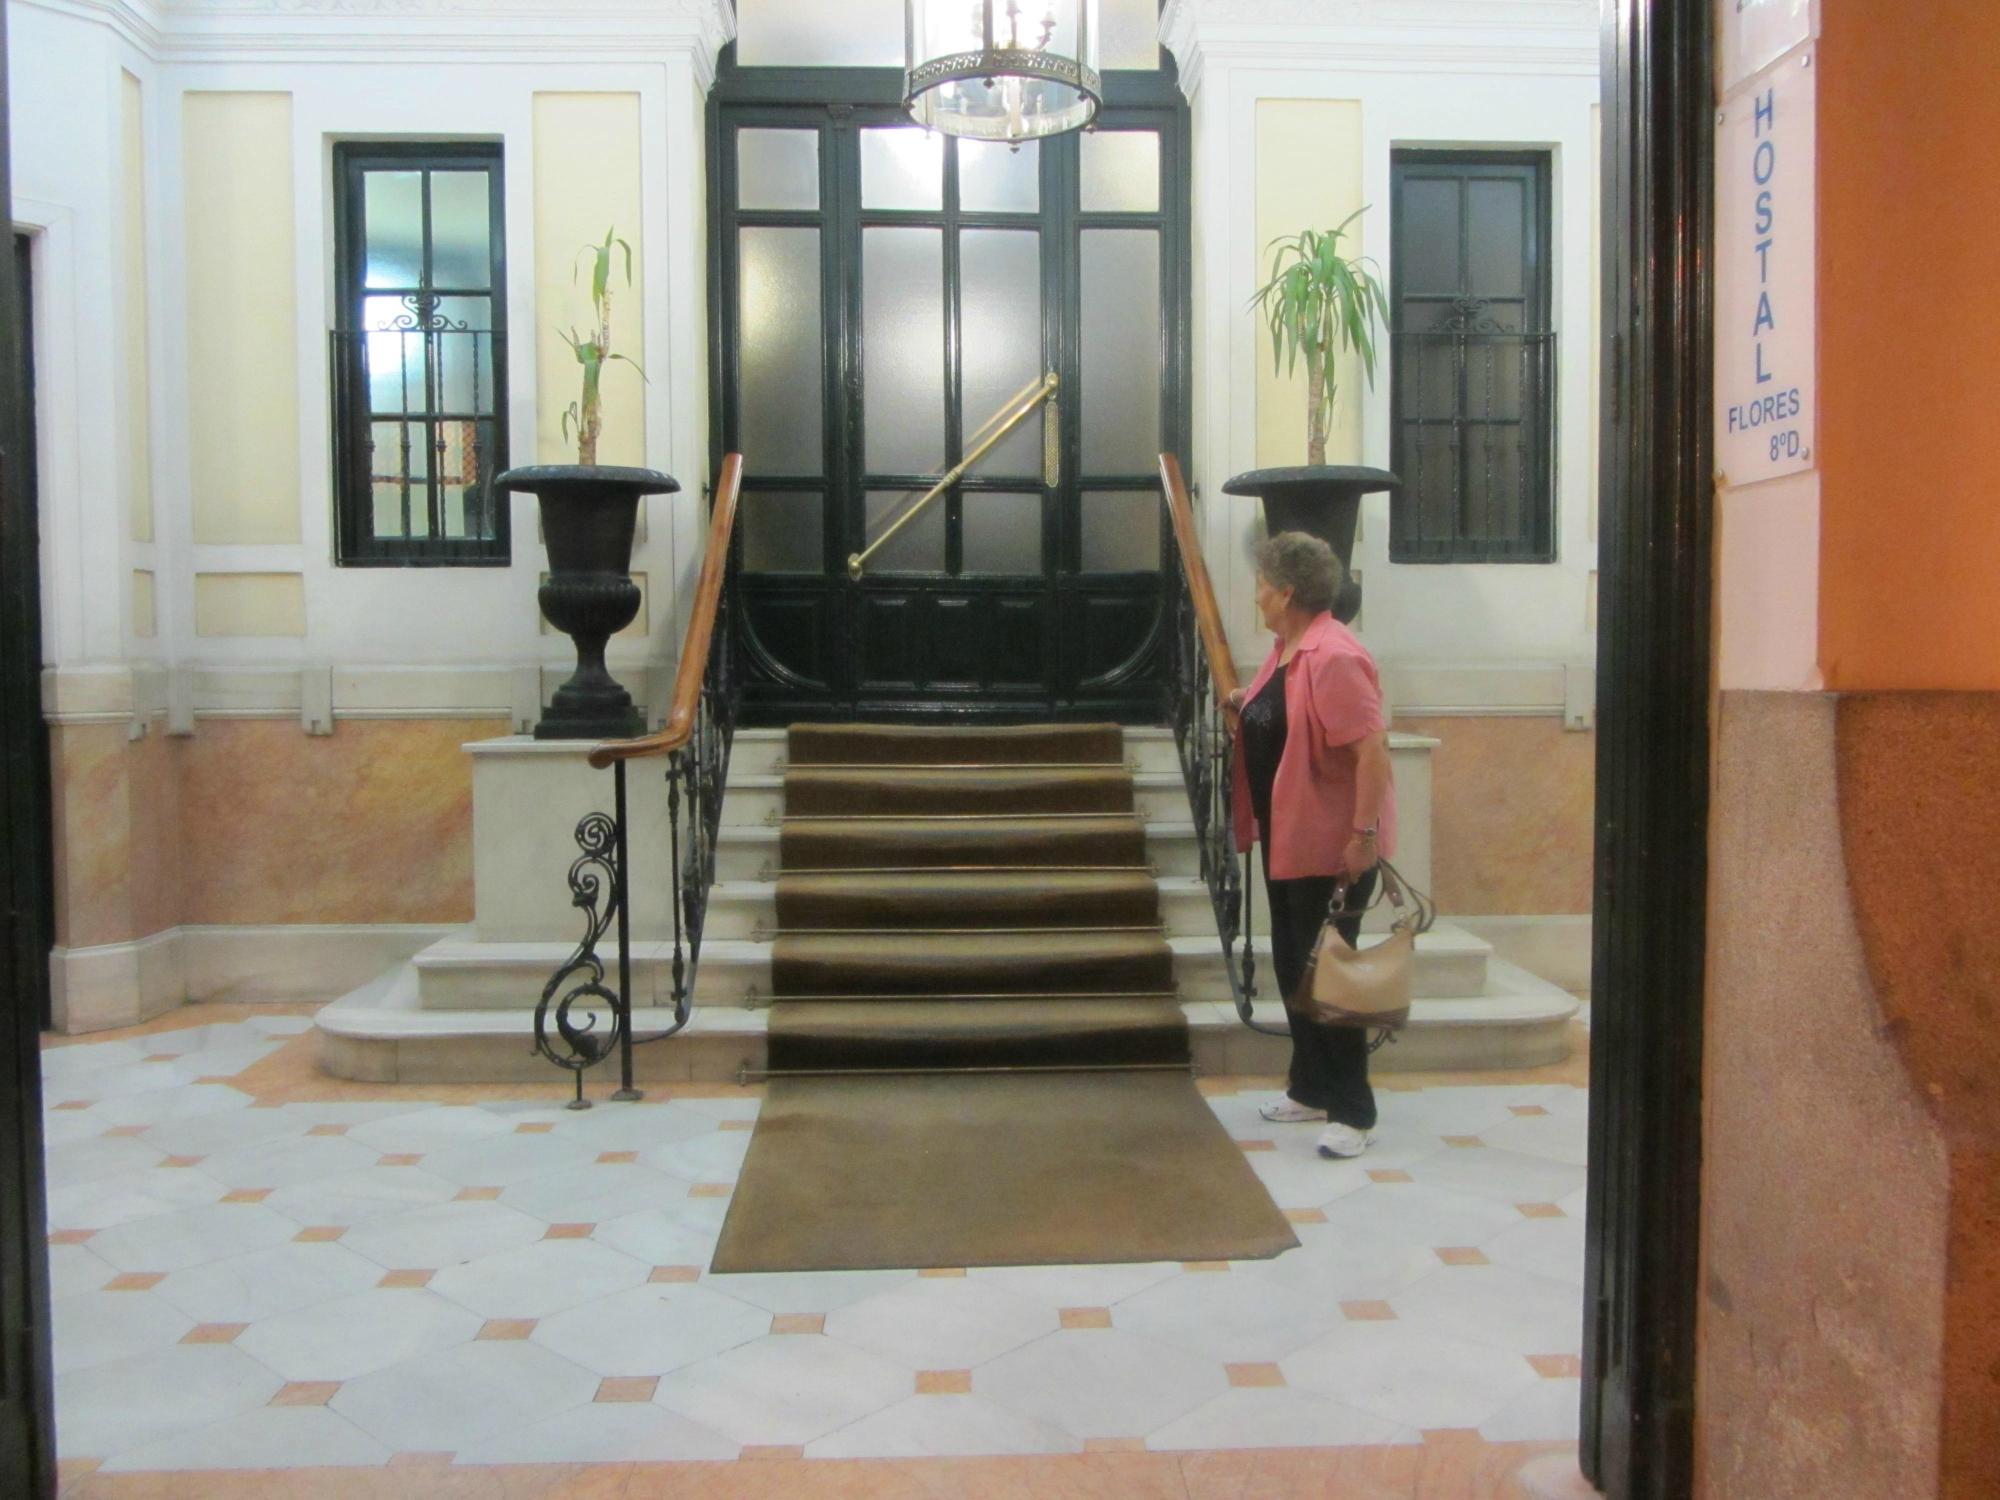 Flores Hotel